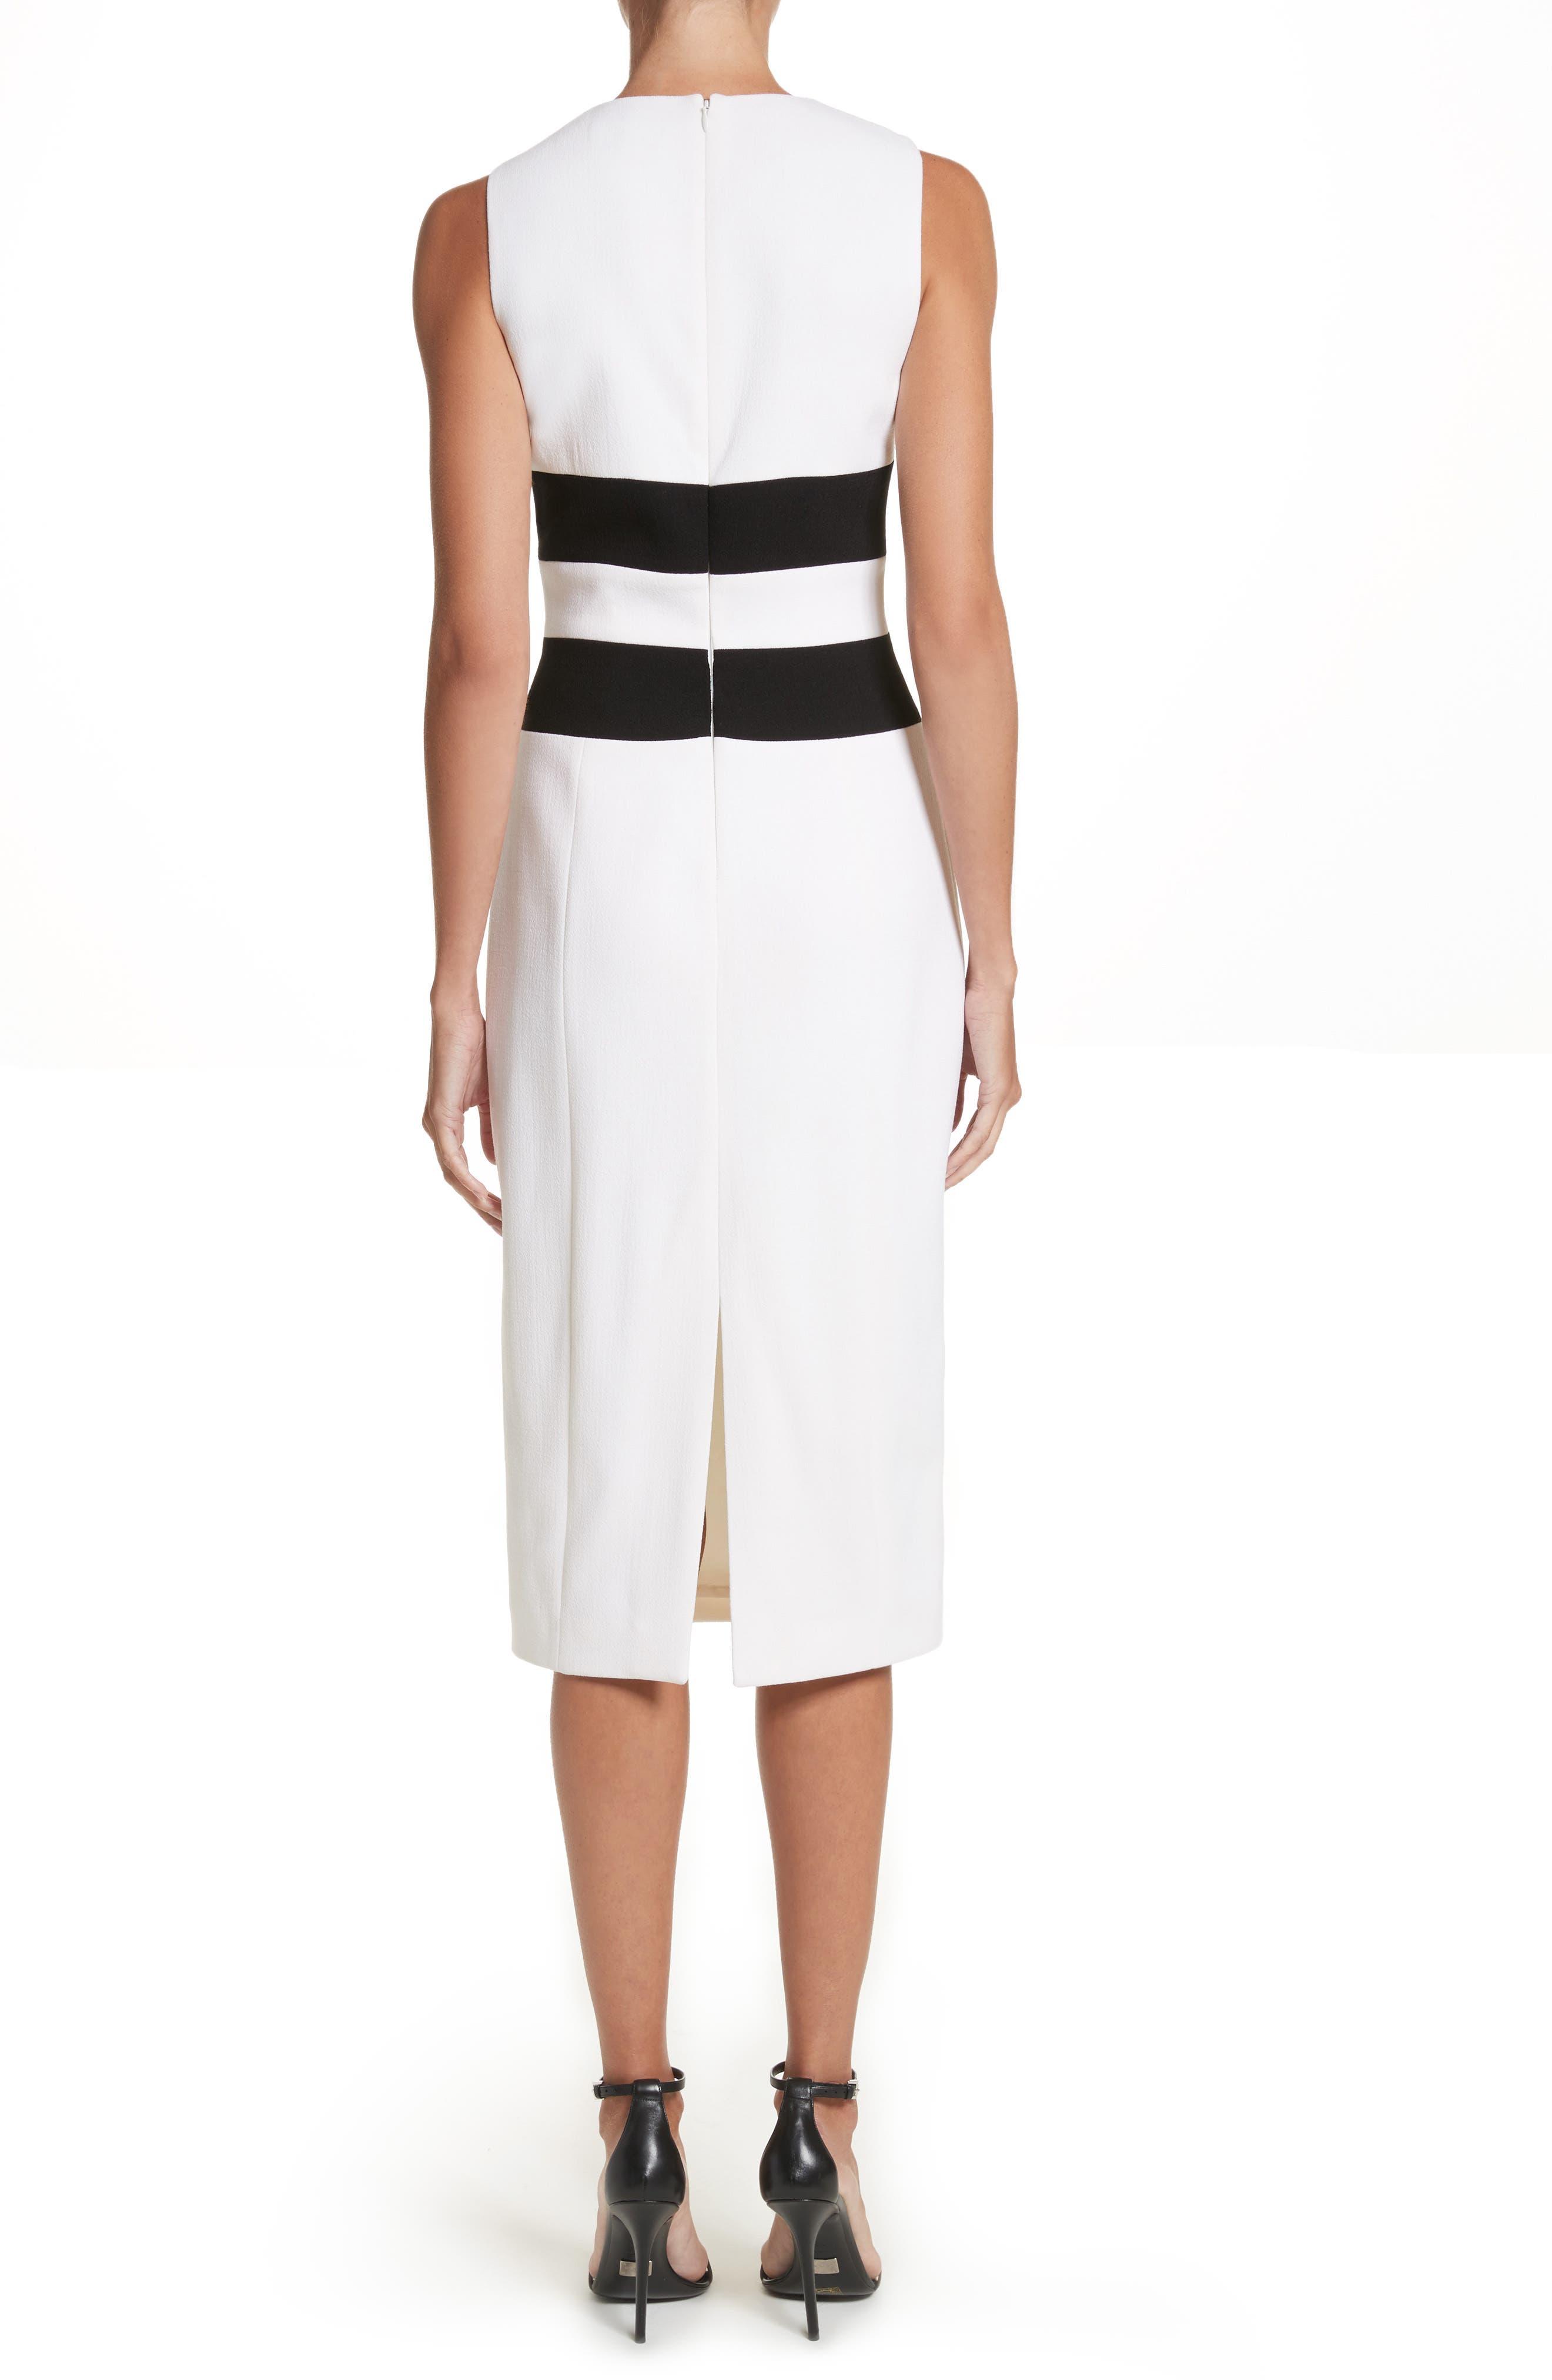 Alternate Image 3  - Michael Kors Contrast Stretch Bouclé Crepe Sheath Dress